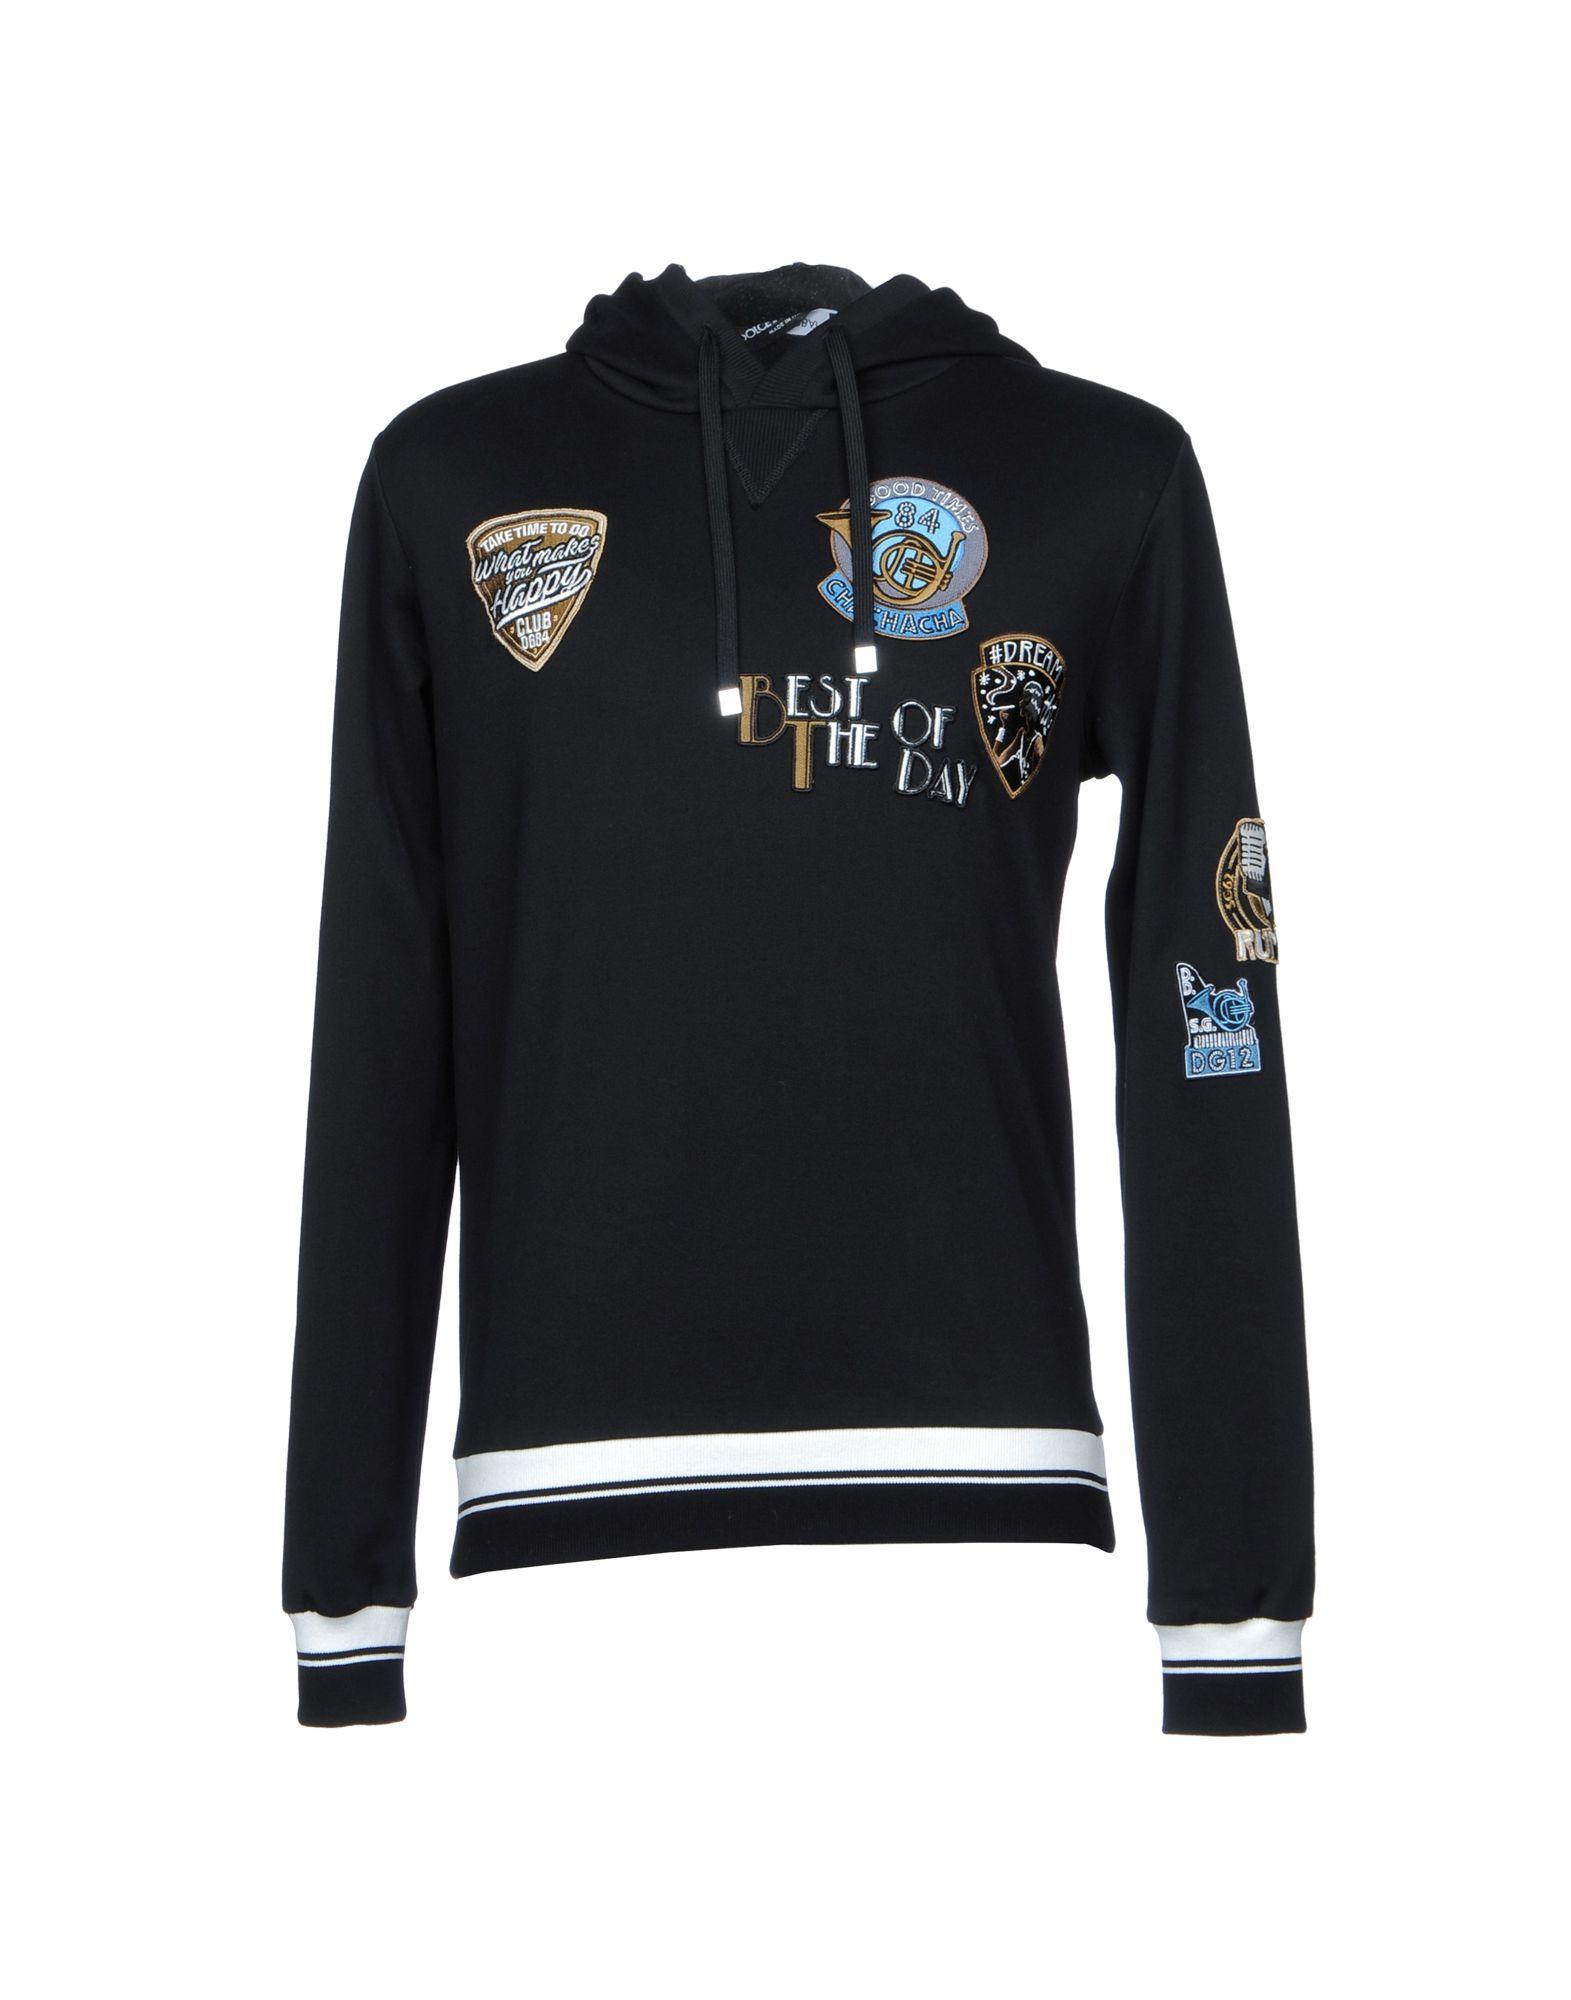 Felpa Uomo Dolce & Gabbana Uomo Felpa - 12077345UD 046523